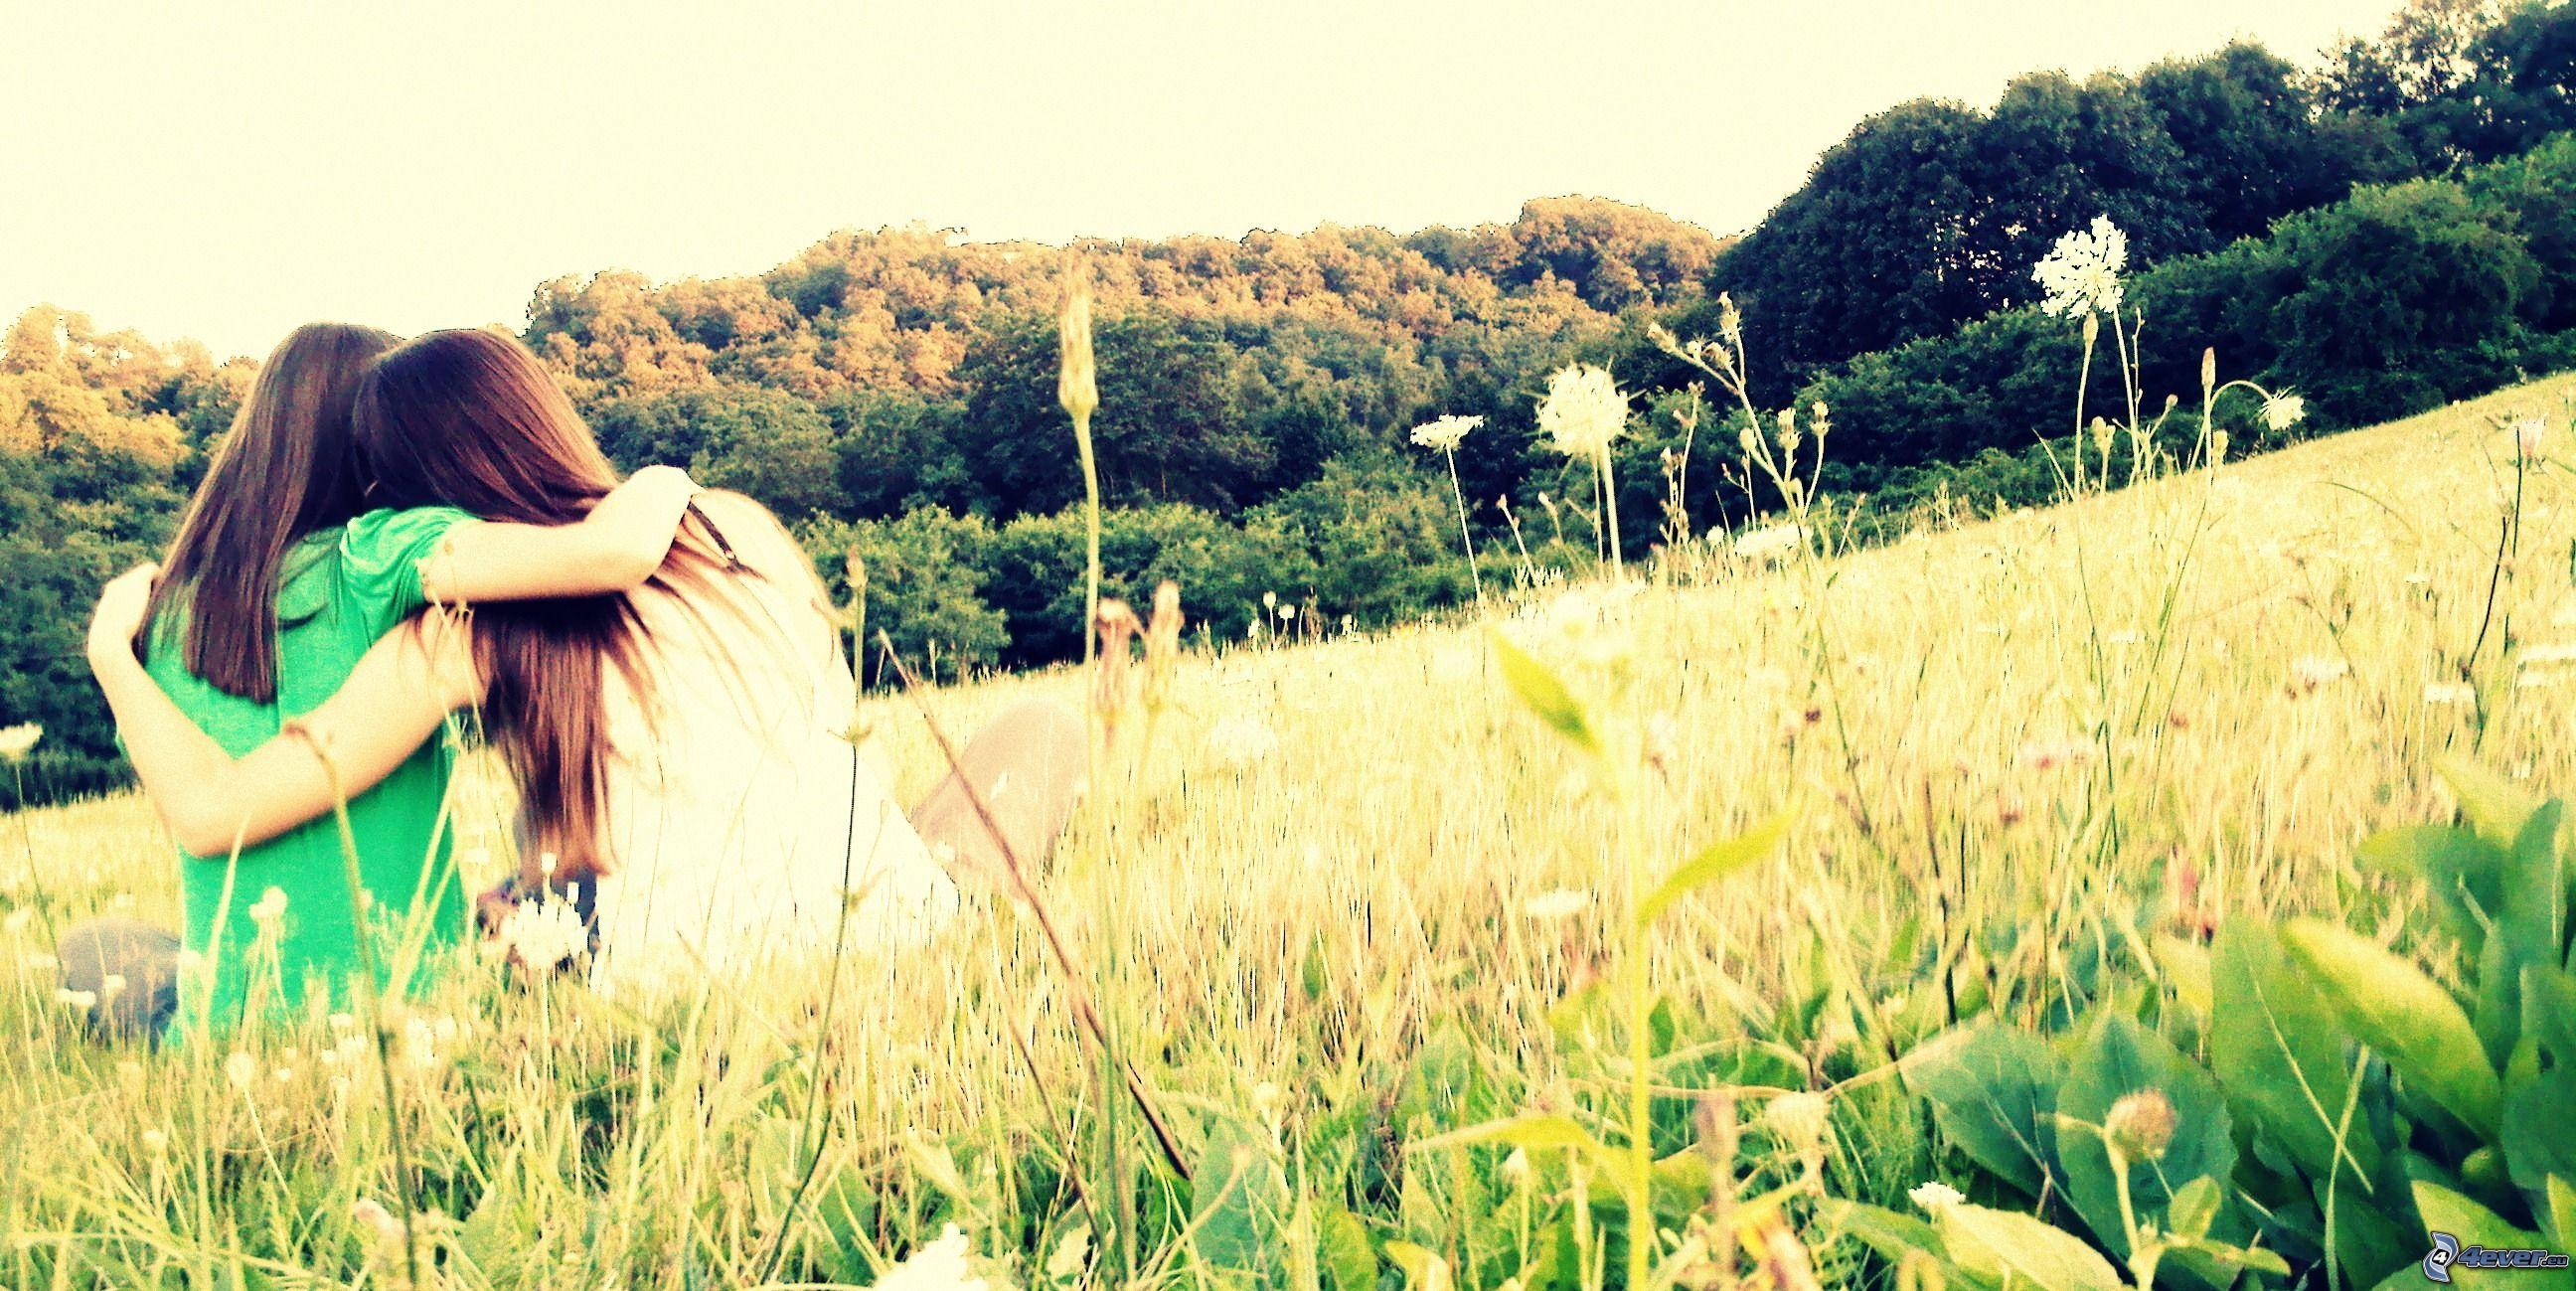 friendly-hug-girls-meadow-forest-149053